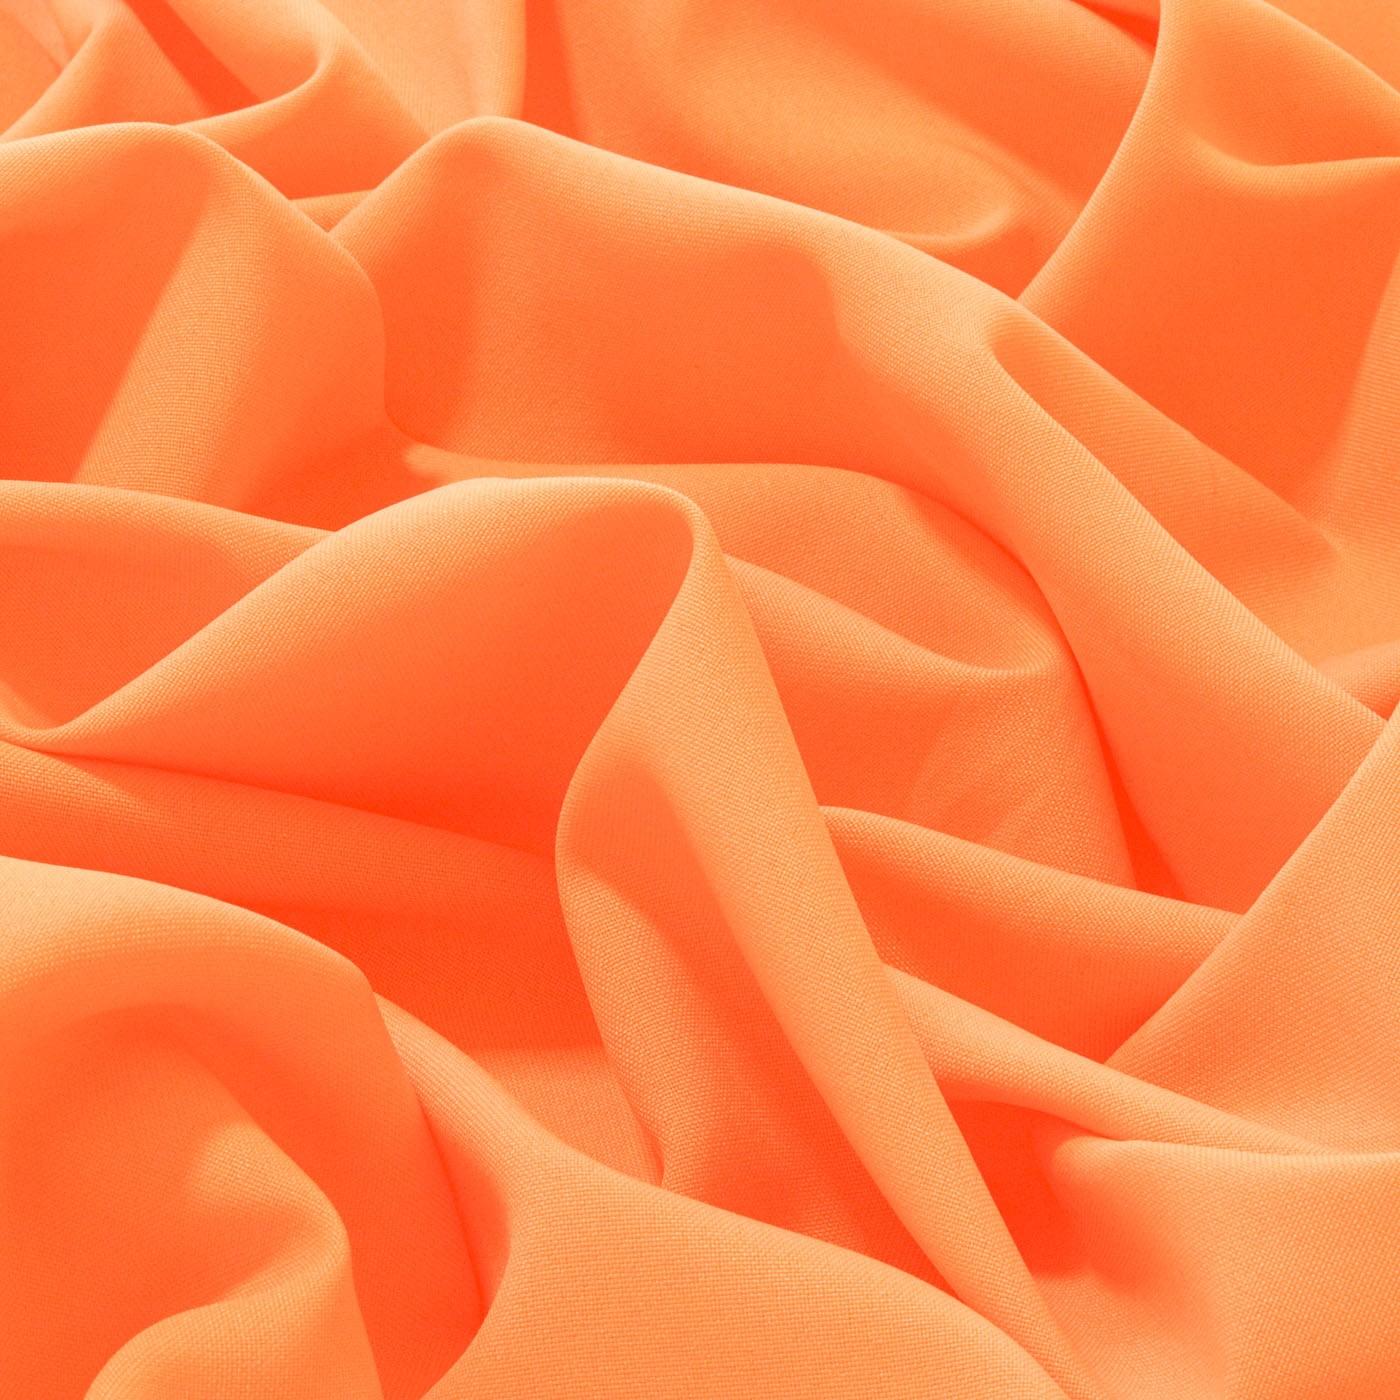 Tecido Oxford Liso 100% Poliester 1,50 m Largura Laranja Neon